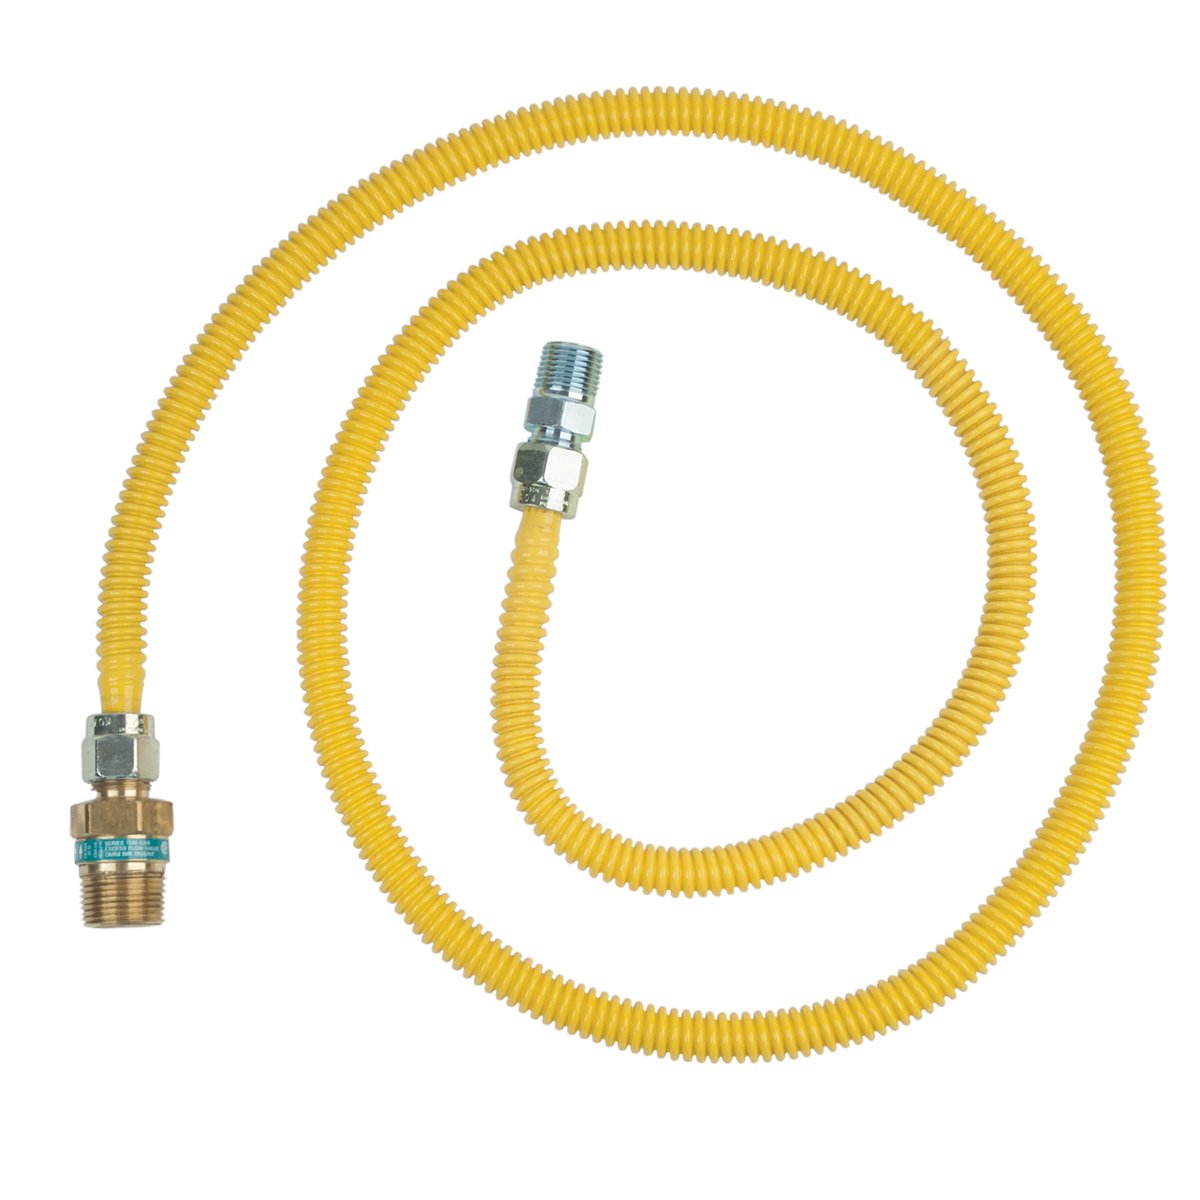 BrassCraft CSSD104R-72 x Safety Plus Gas 1/2'' Od Connector With 1/2'' Female Flare Efv x 1/2'' Mip x 72''